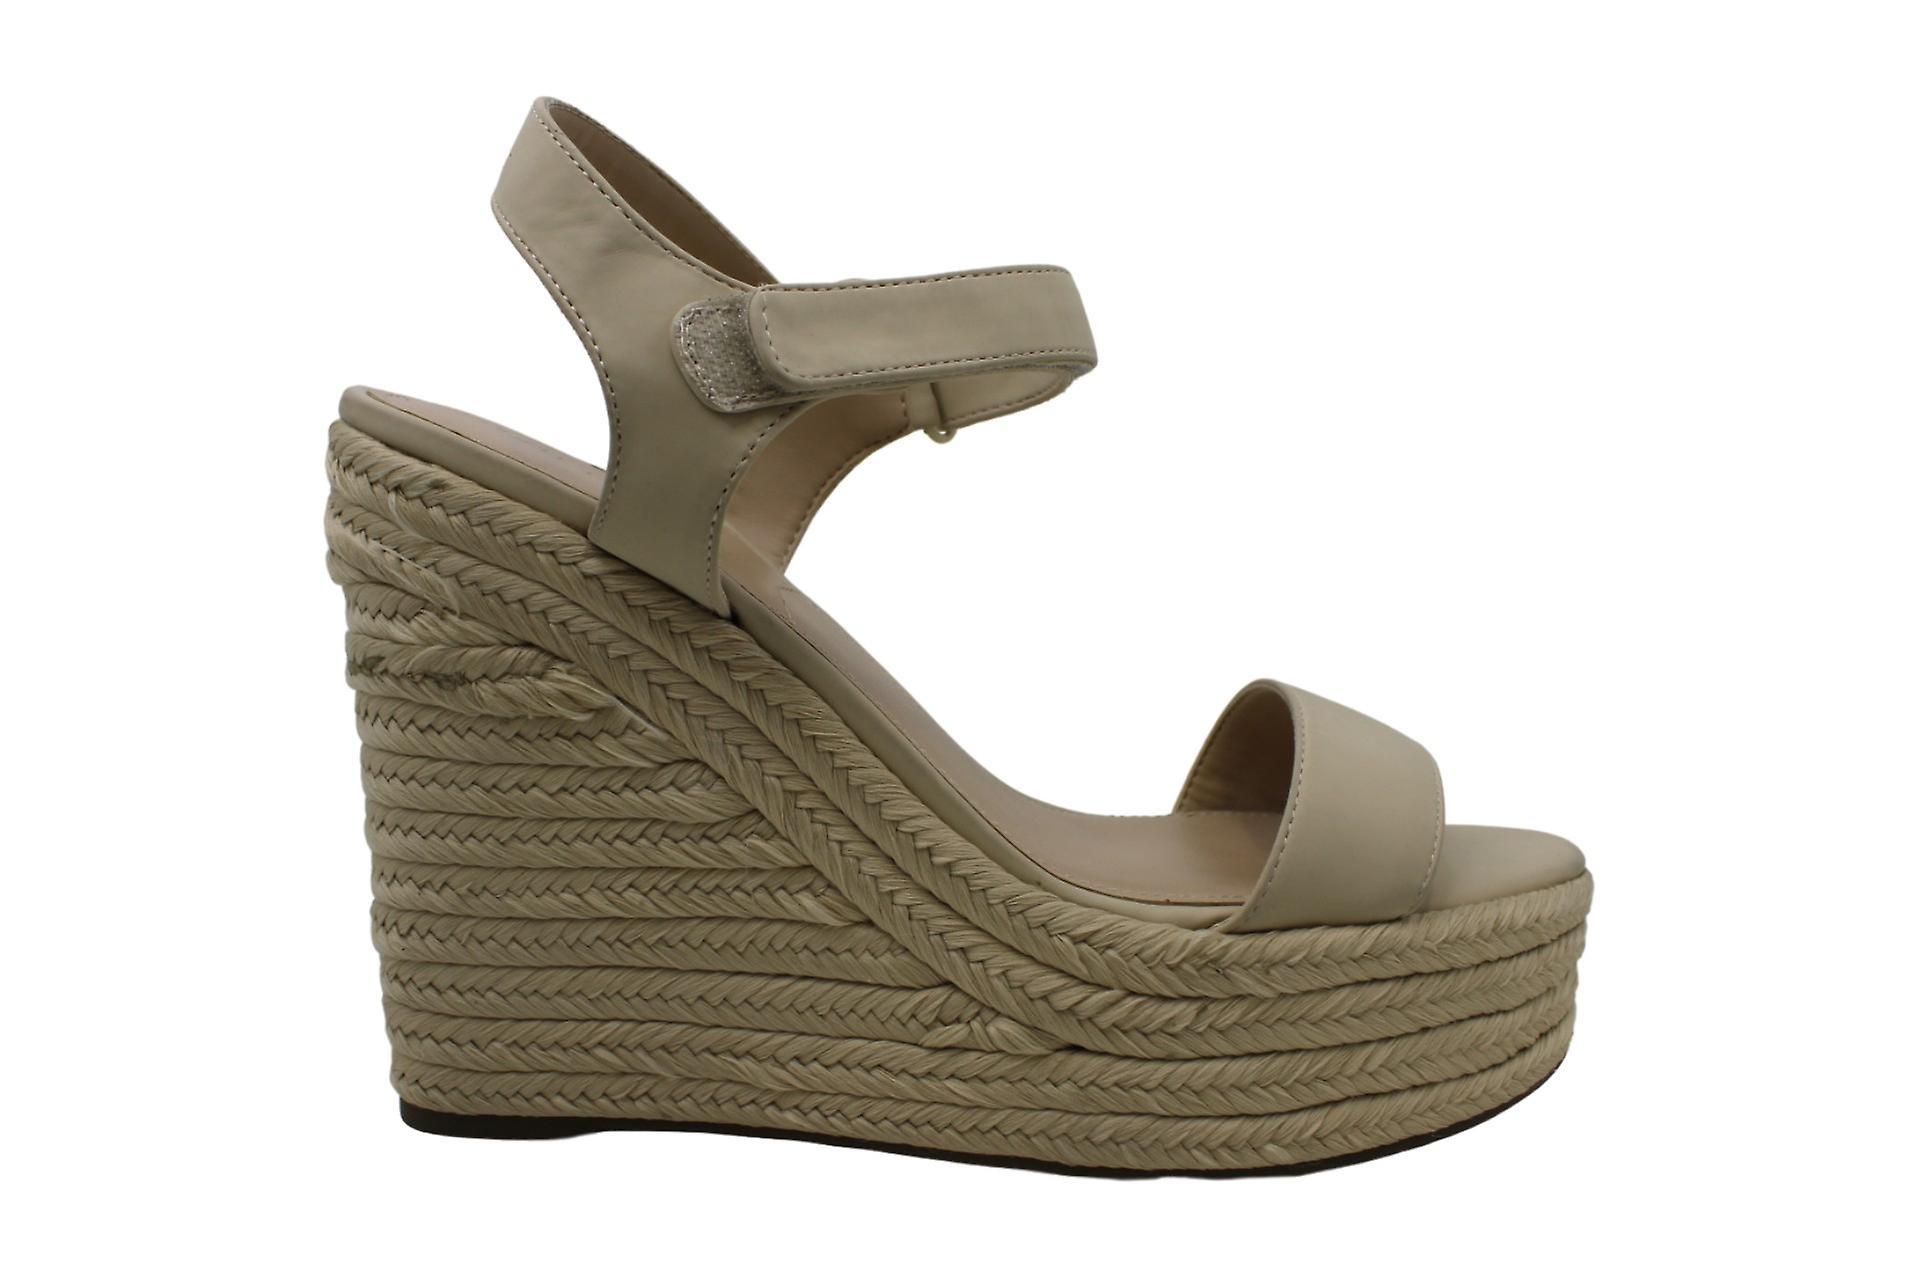 KENDALL - KYLIE Womens Grand Open Toe Casual Platform Sandals